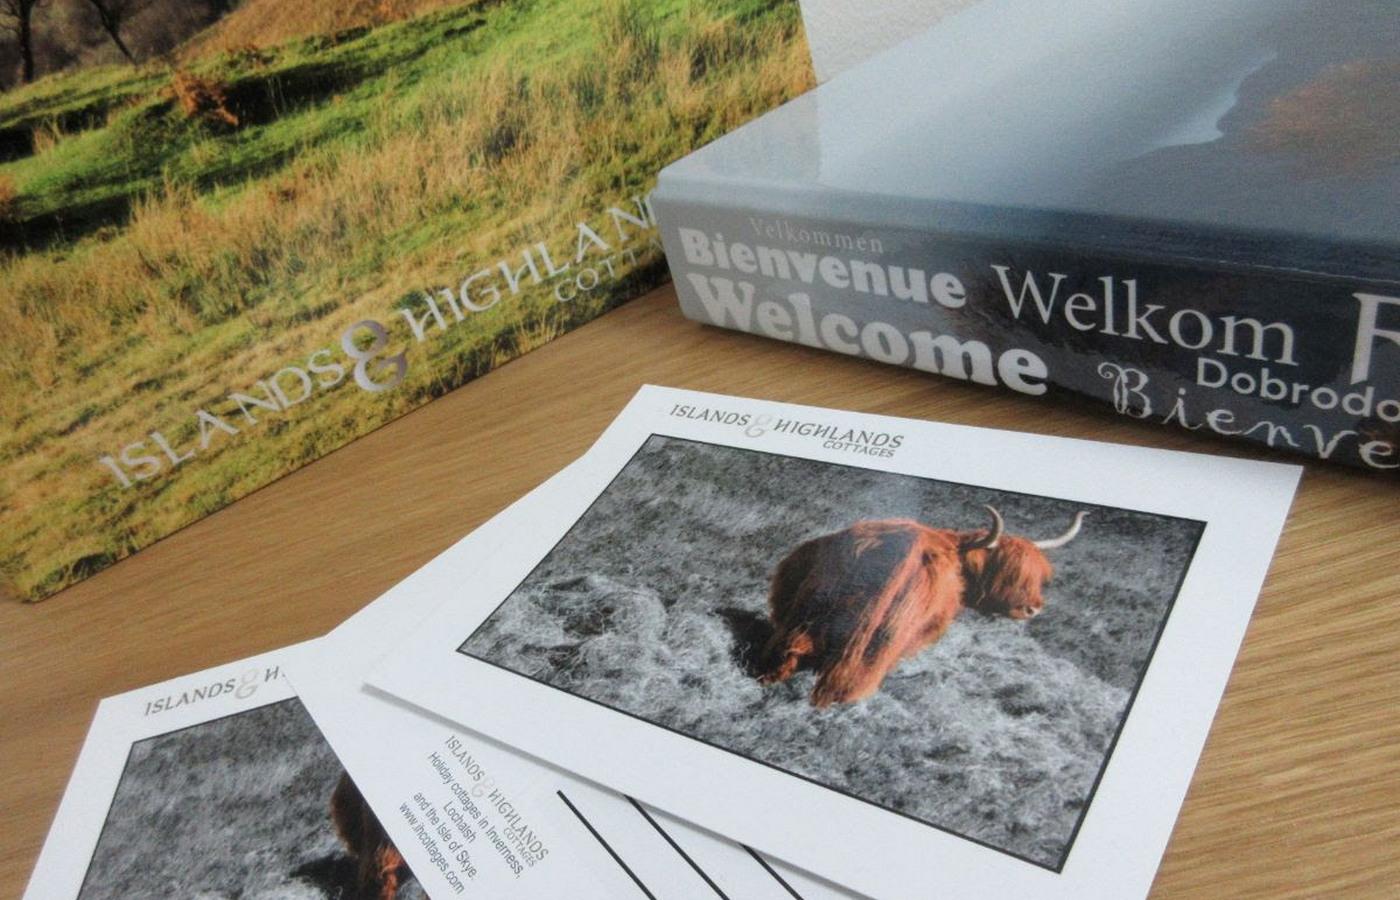 Islands and highlands cottages welcome folders